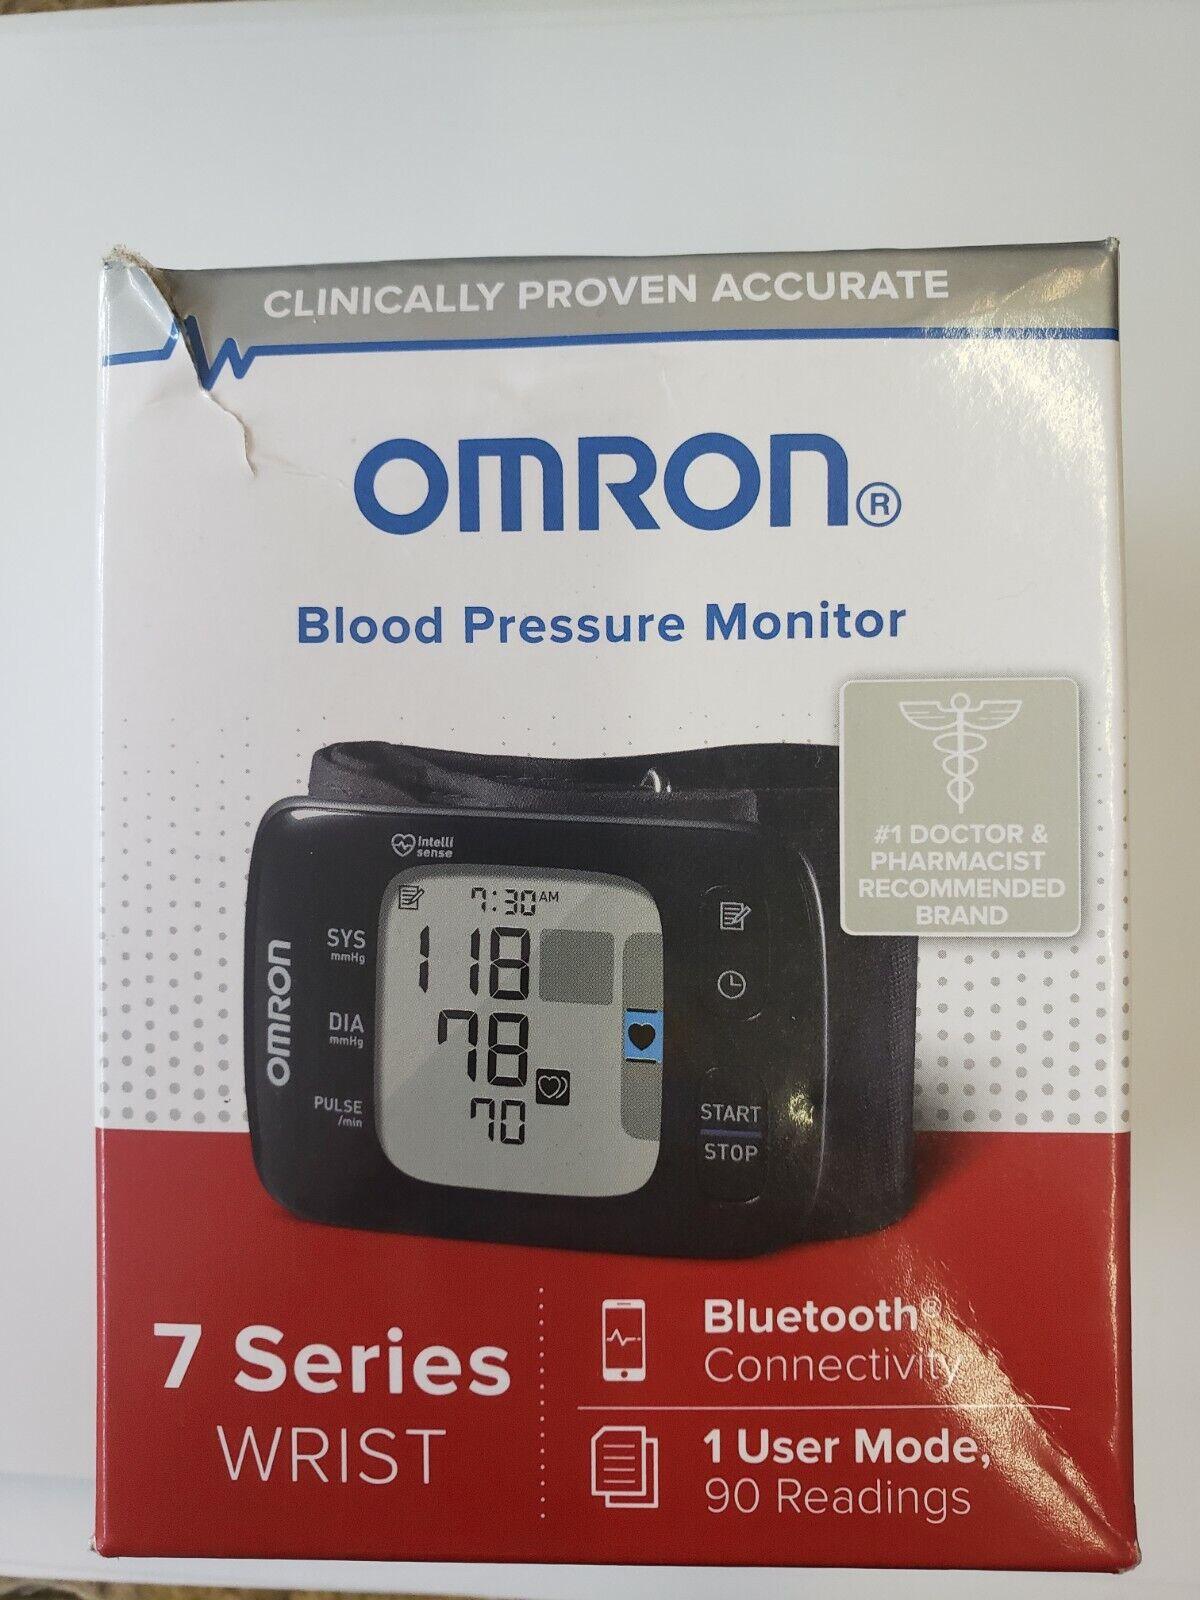 New Omron Blood Pressure Monitor 7 Series Wrist Bluetooth He